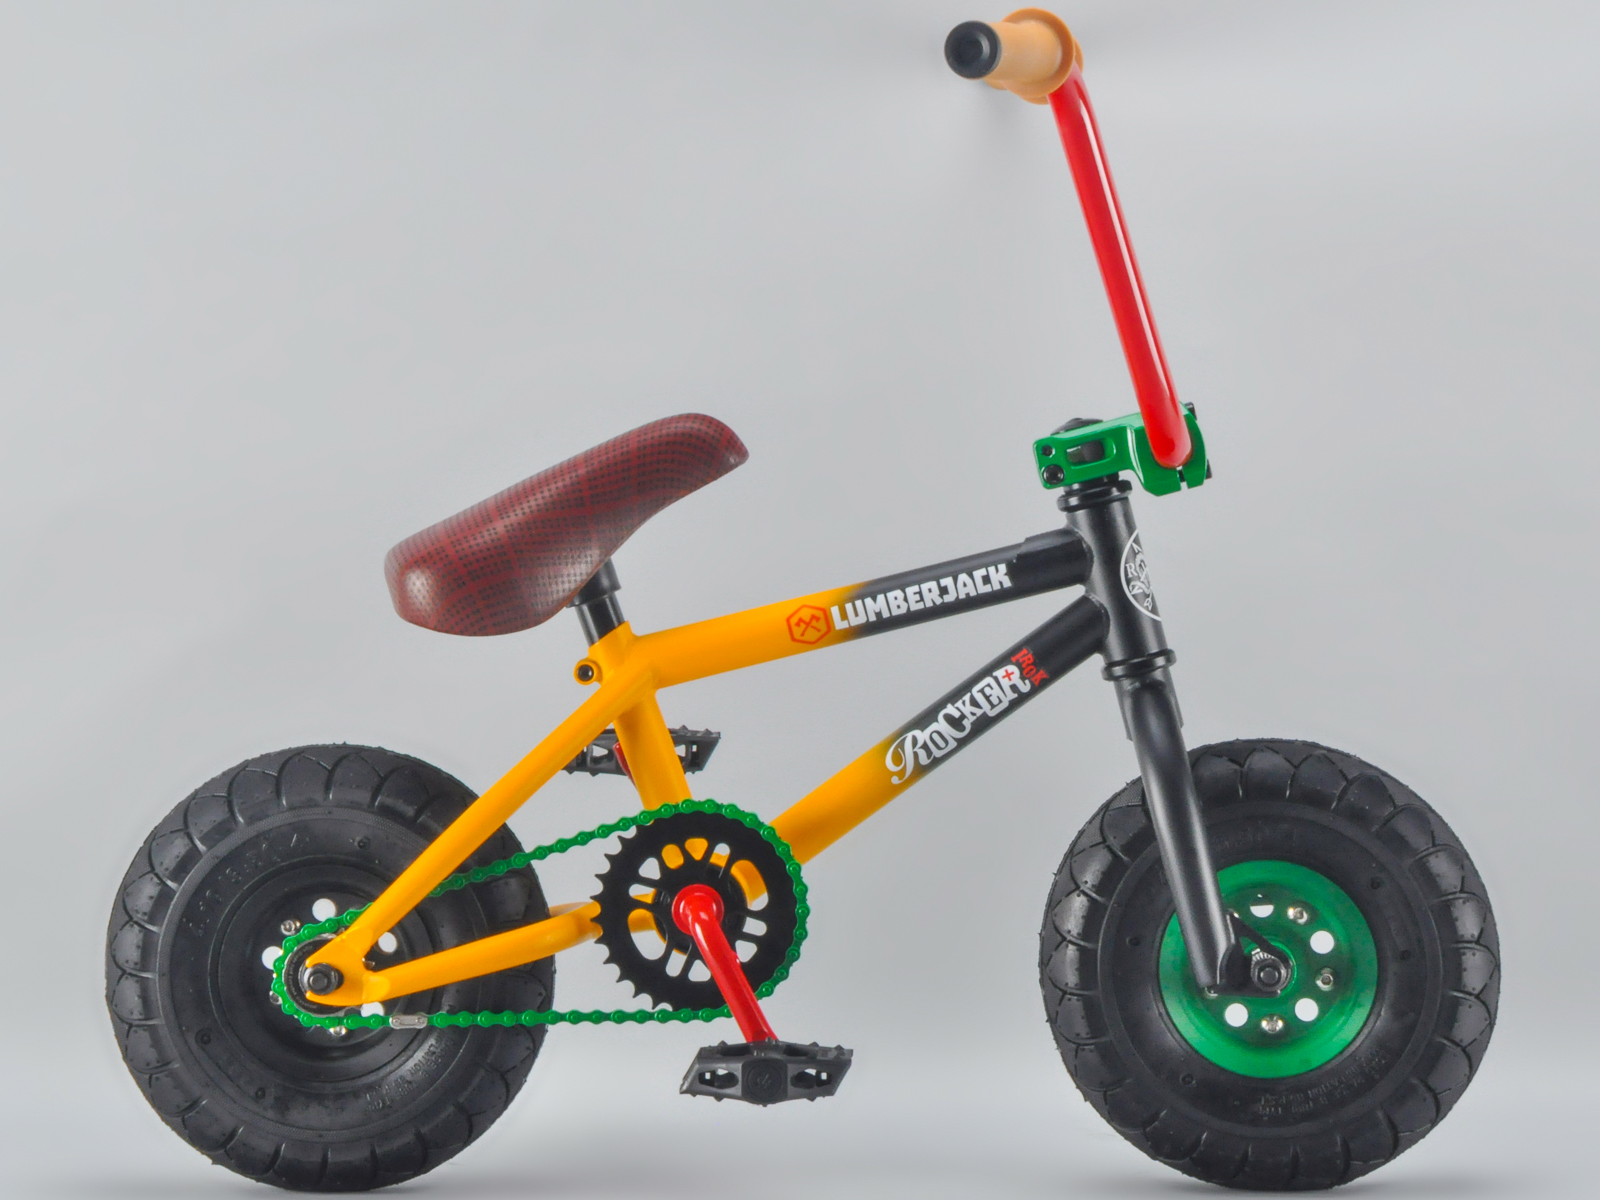 rocker bmx mini bmx bike lumberjack irok rkr ebay. Black Bedroom Furniture Sets. Home Design Ideas